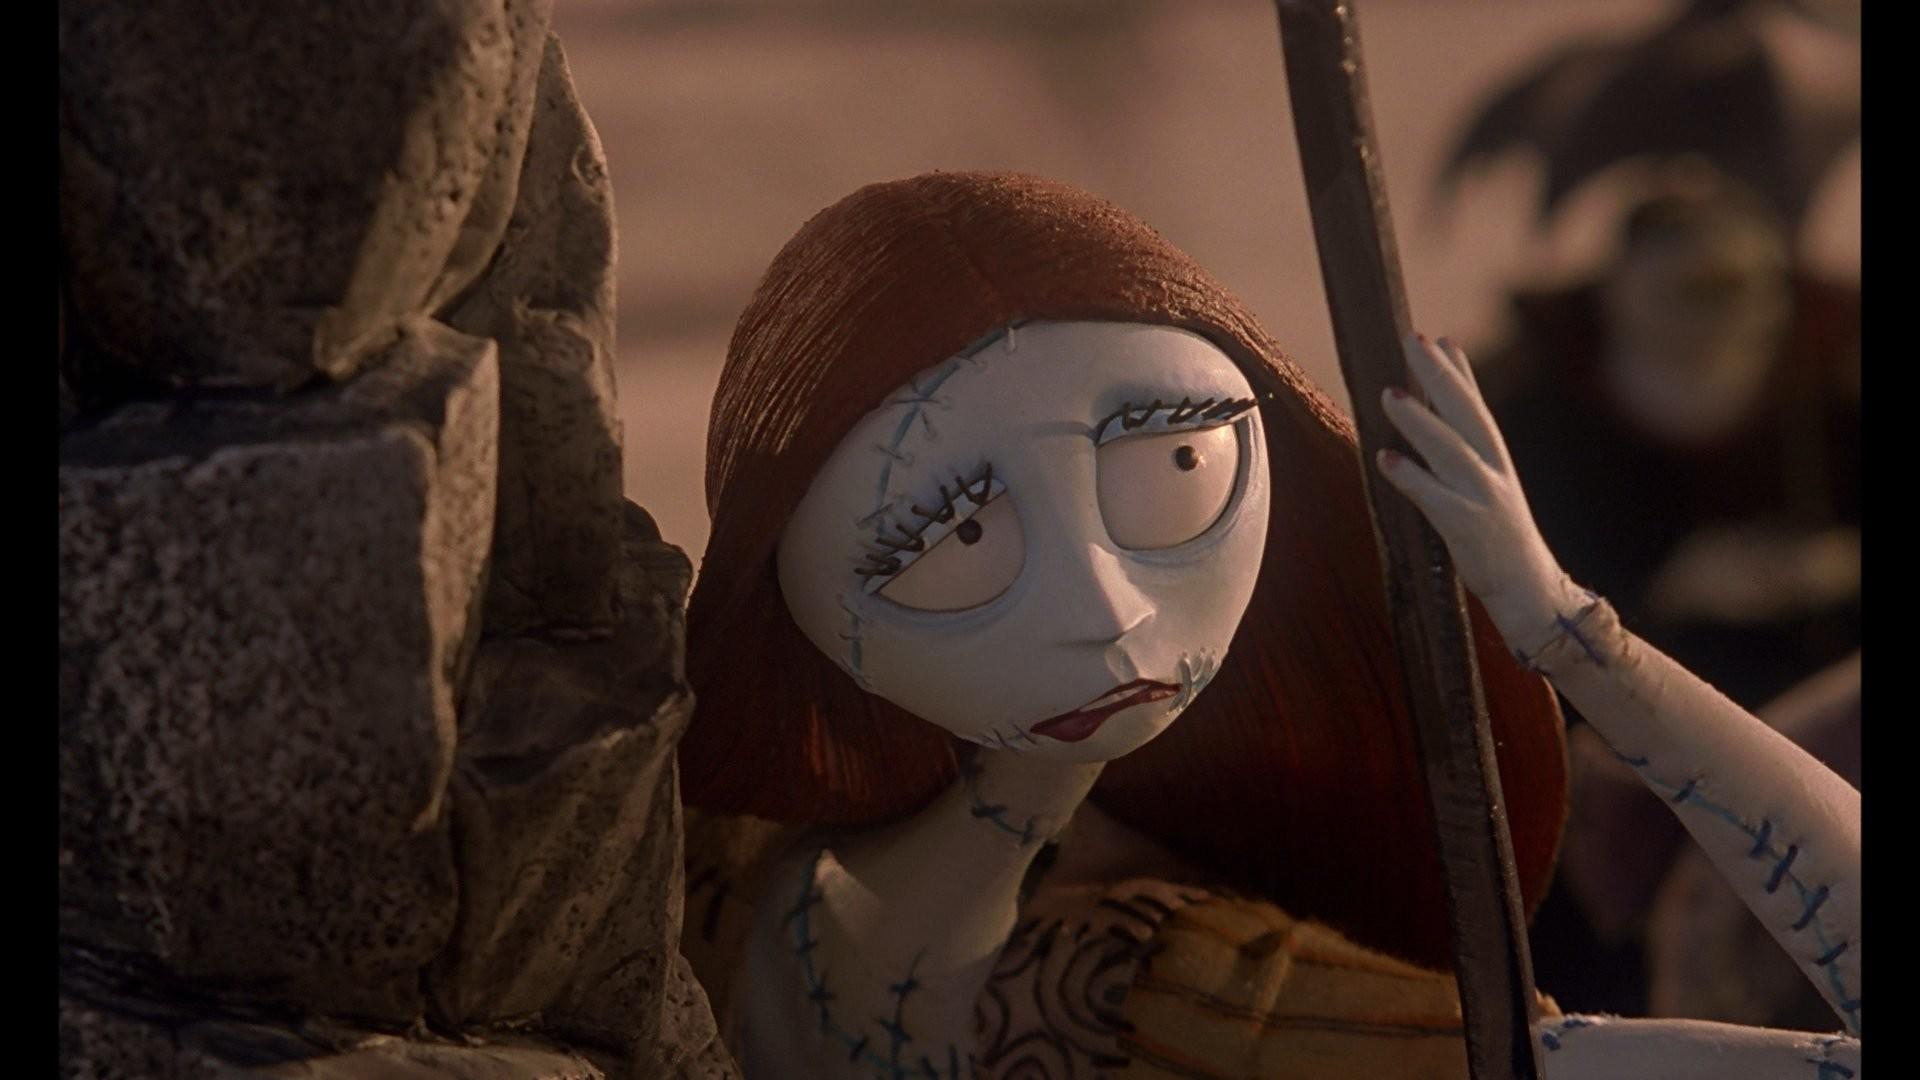 Sally doll (Nightmare Before Christmas)